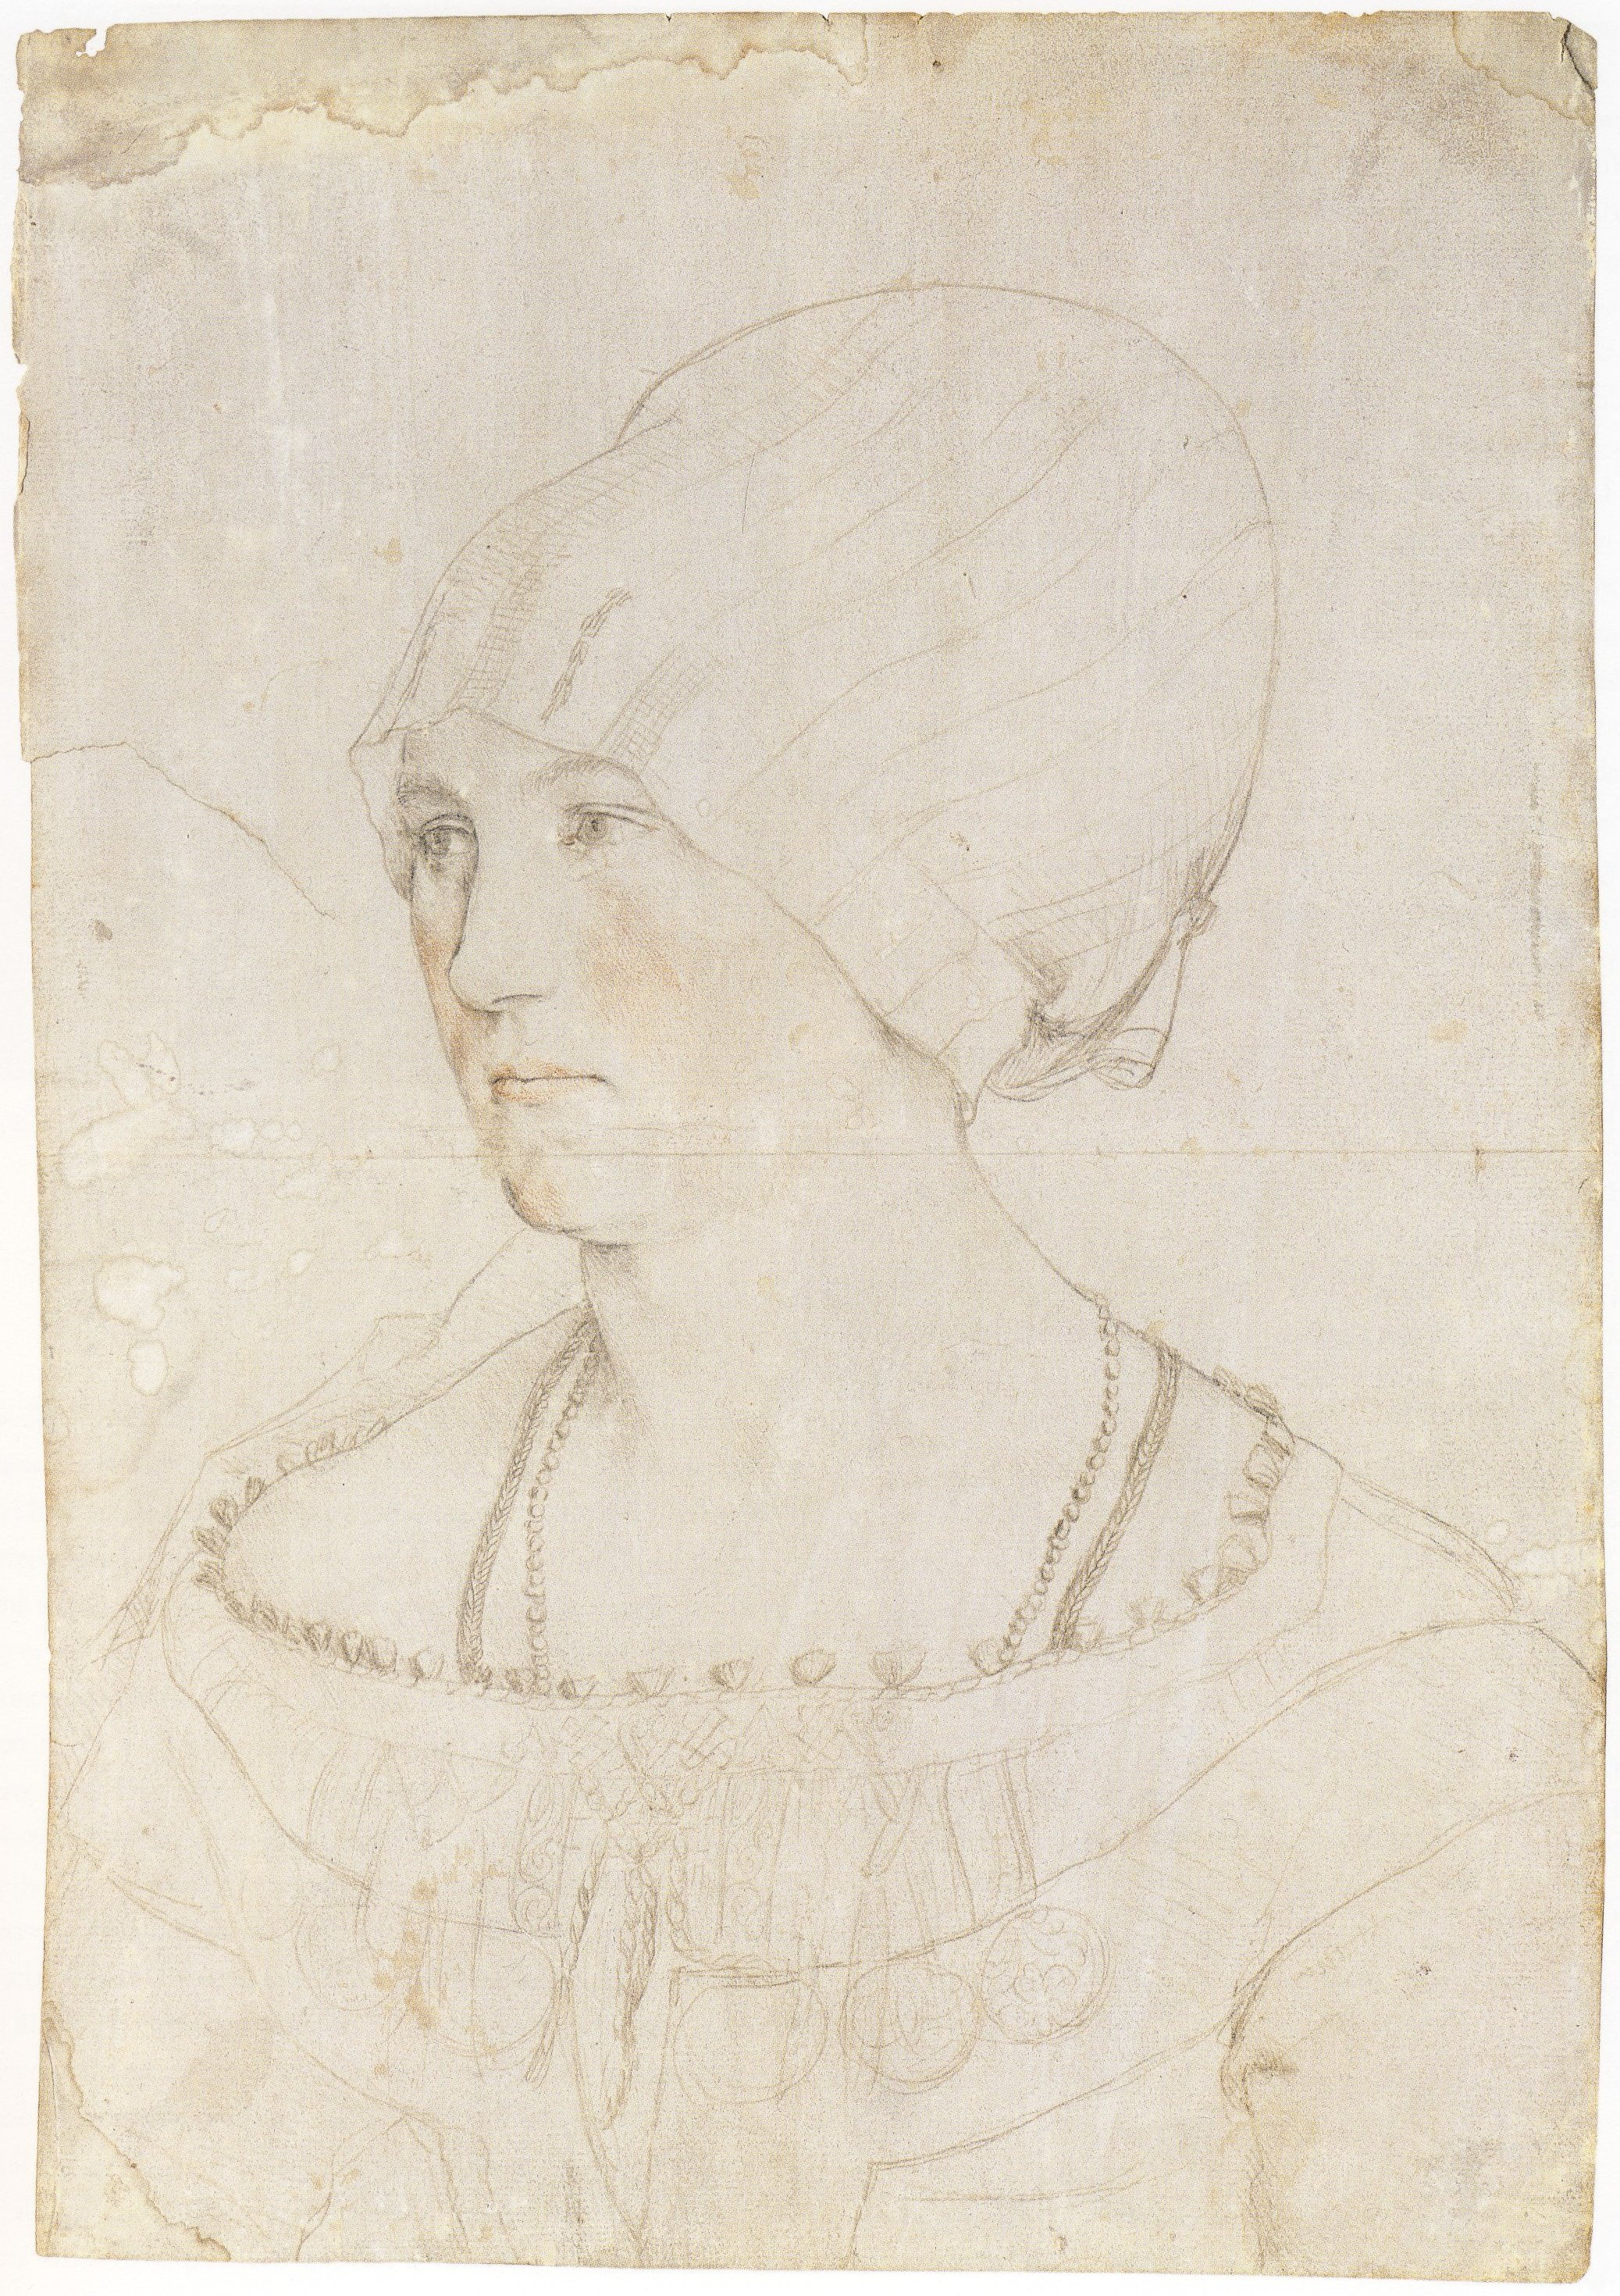 Portrait of Dorothea Meyer, nee Kannengiesser. 1516